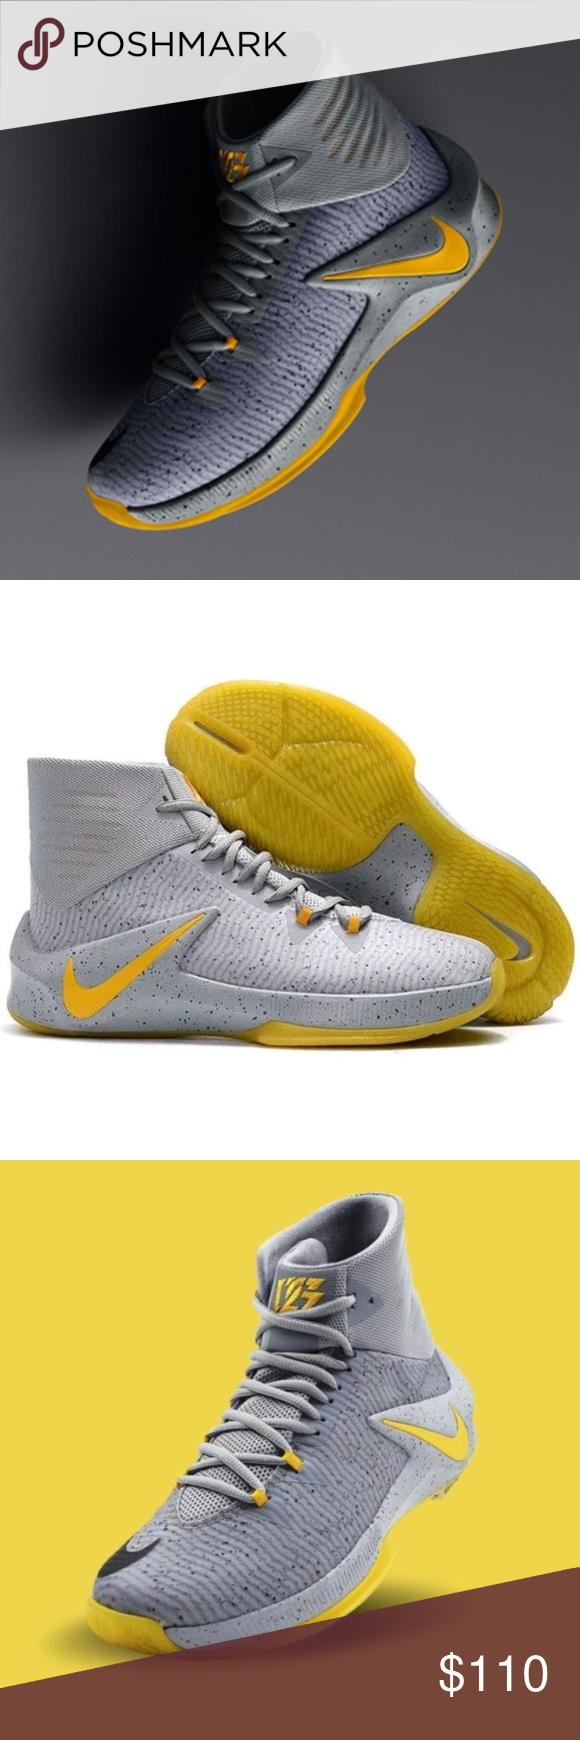 new product 3261e 0cd6c NIB Men s Nike Zoom Clear Out PE, M 9.5 NIB Nike Zoom Clear Out PE